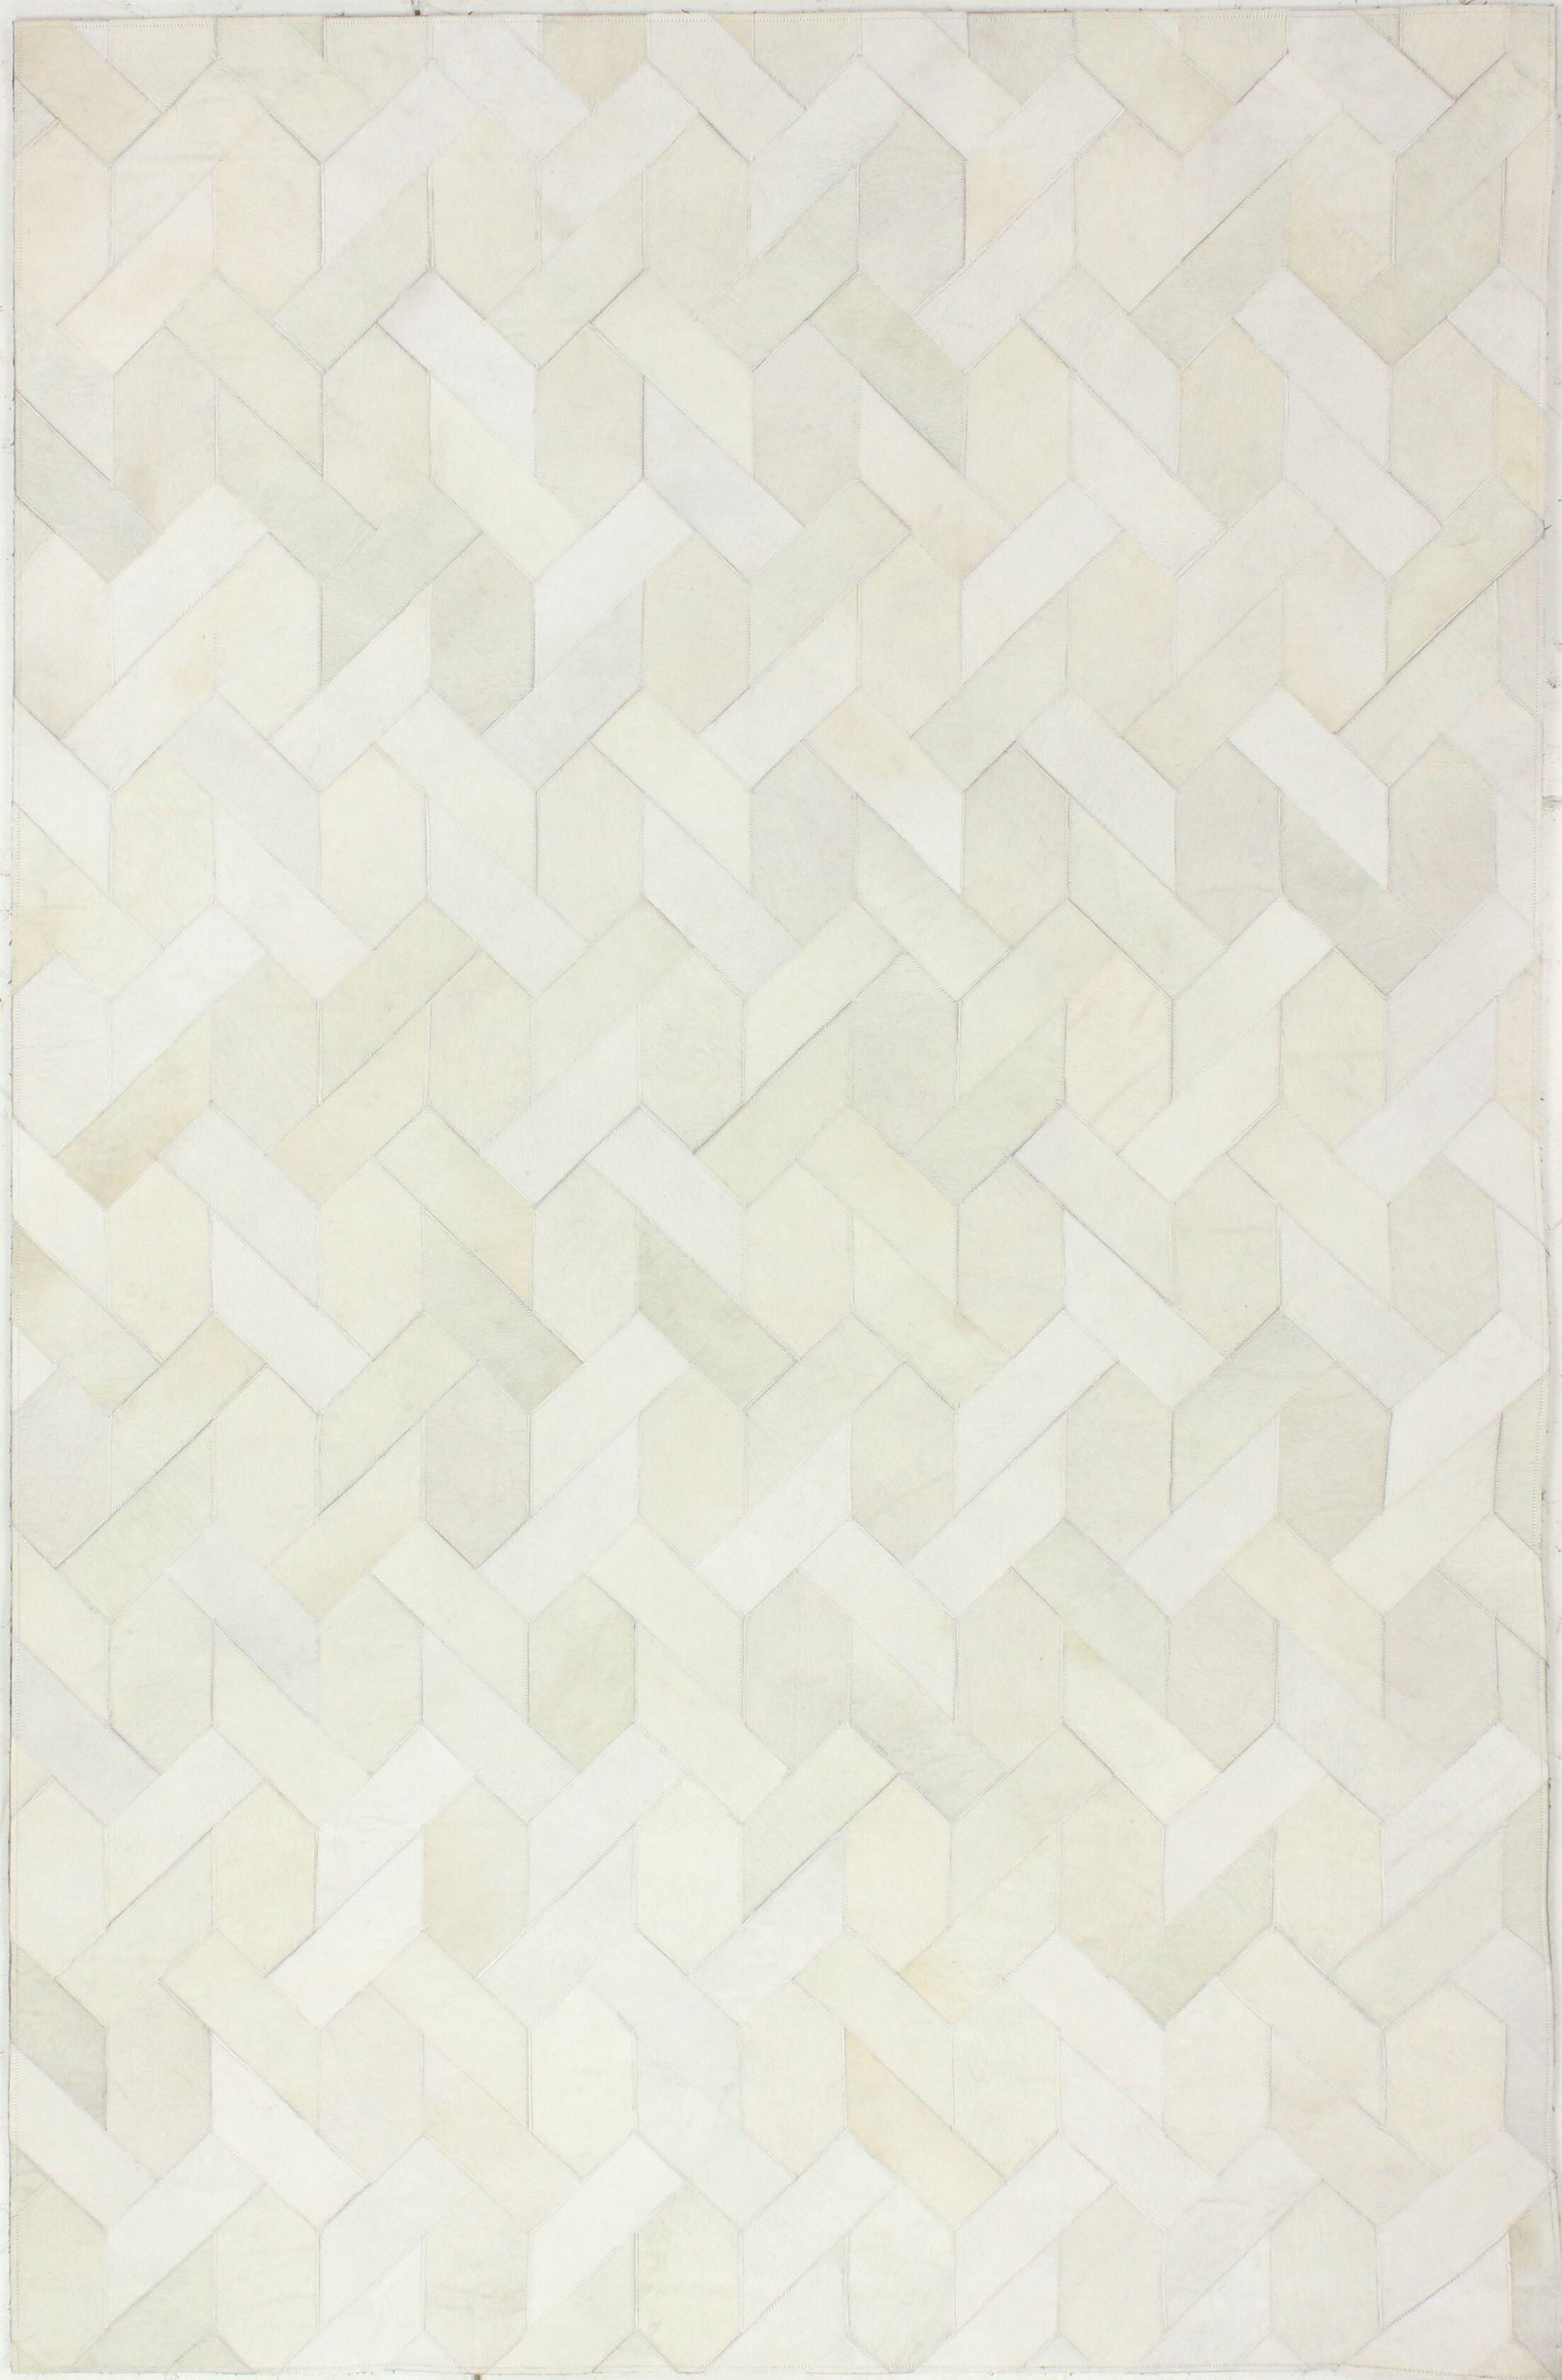 Heath Hand-Woven White Area Rug Rug Size: 8' x 10'